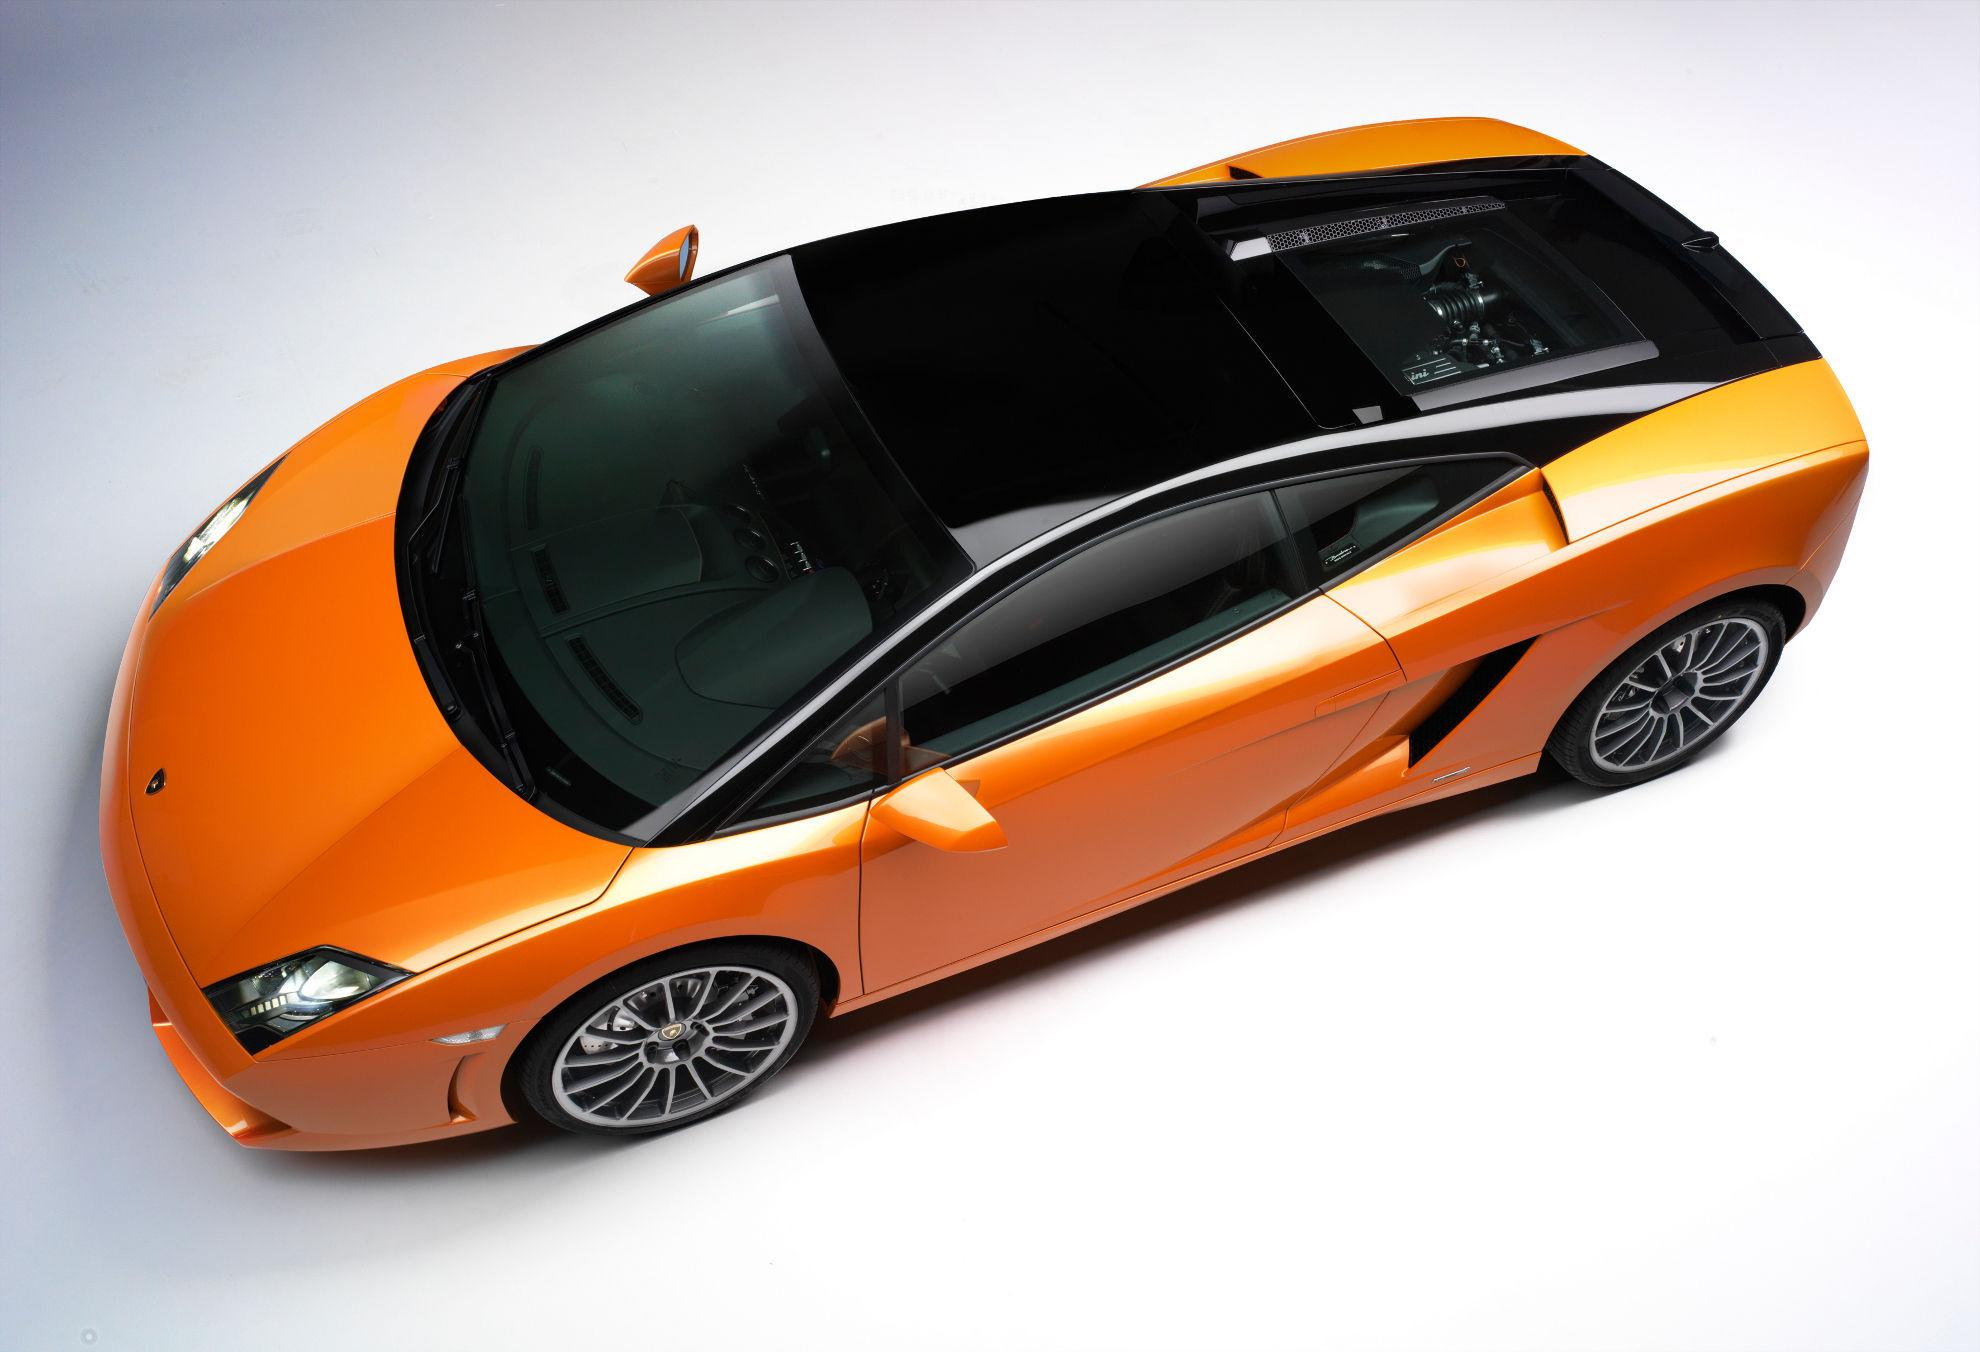 Lamborghini Gallardo-LP-560-4 Bicolore